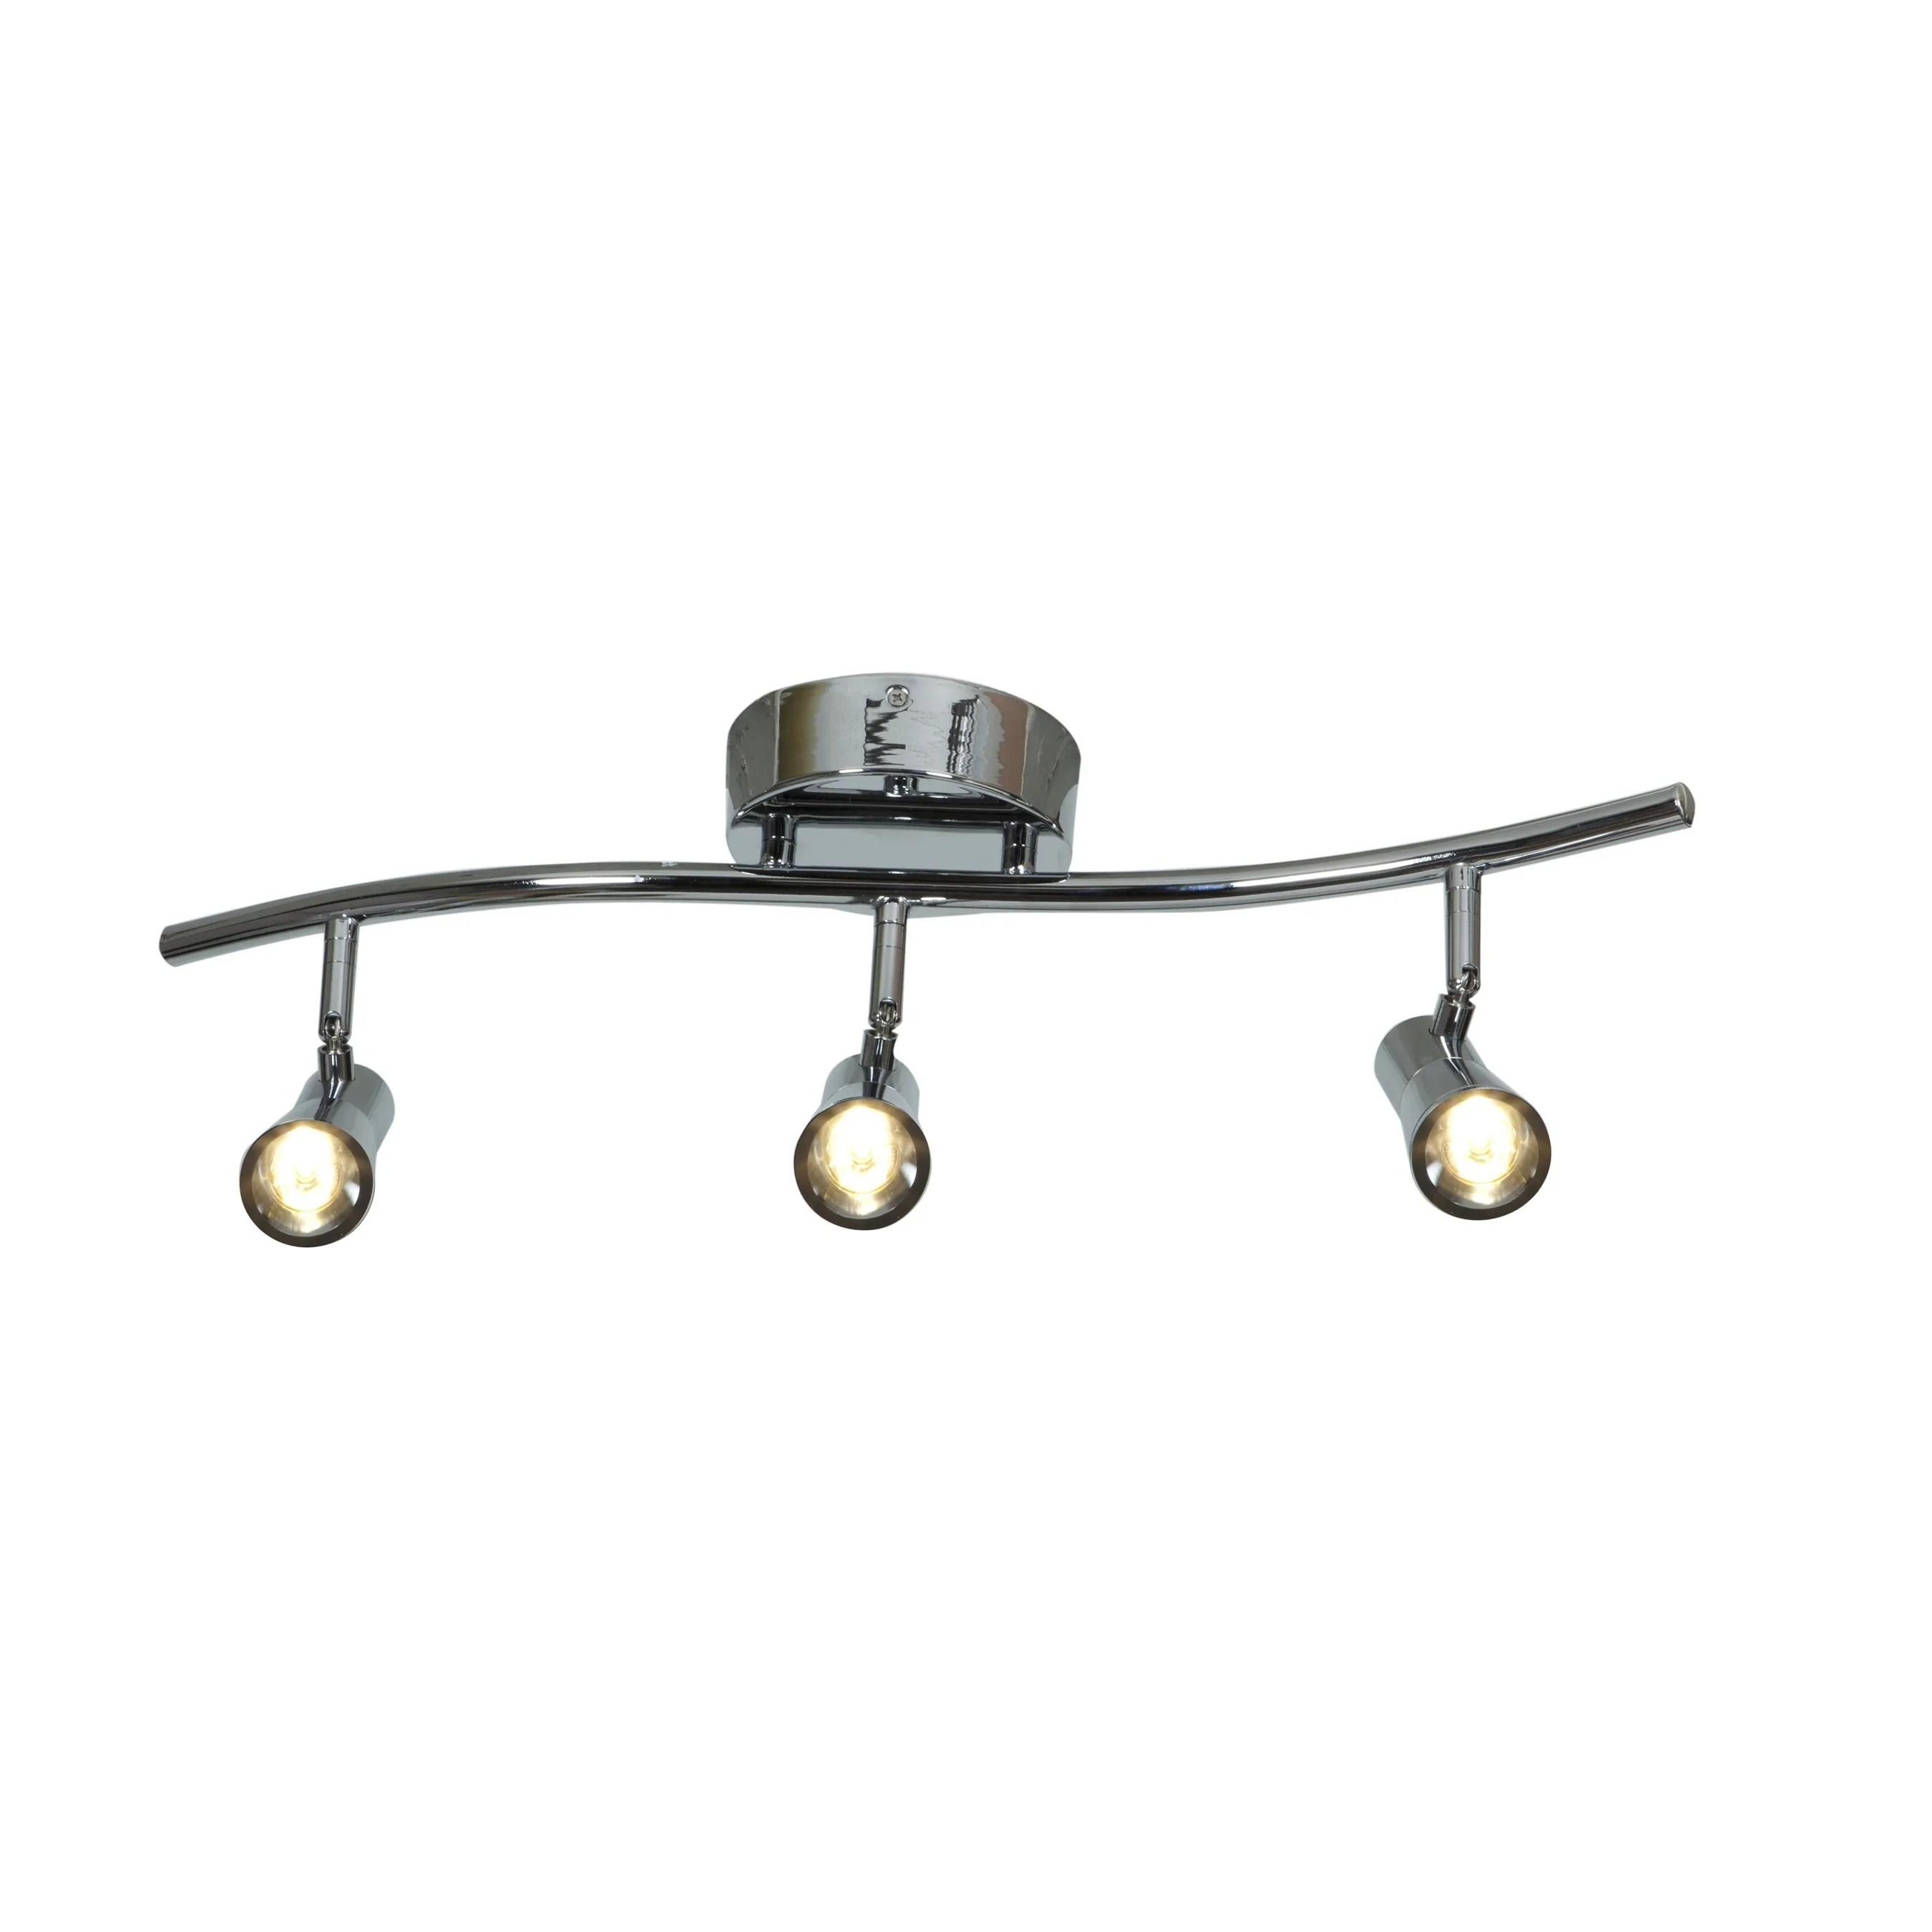 Access Lighting Sleek Steel 3 Light Led Spotlight Semi